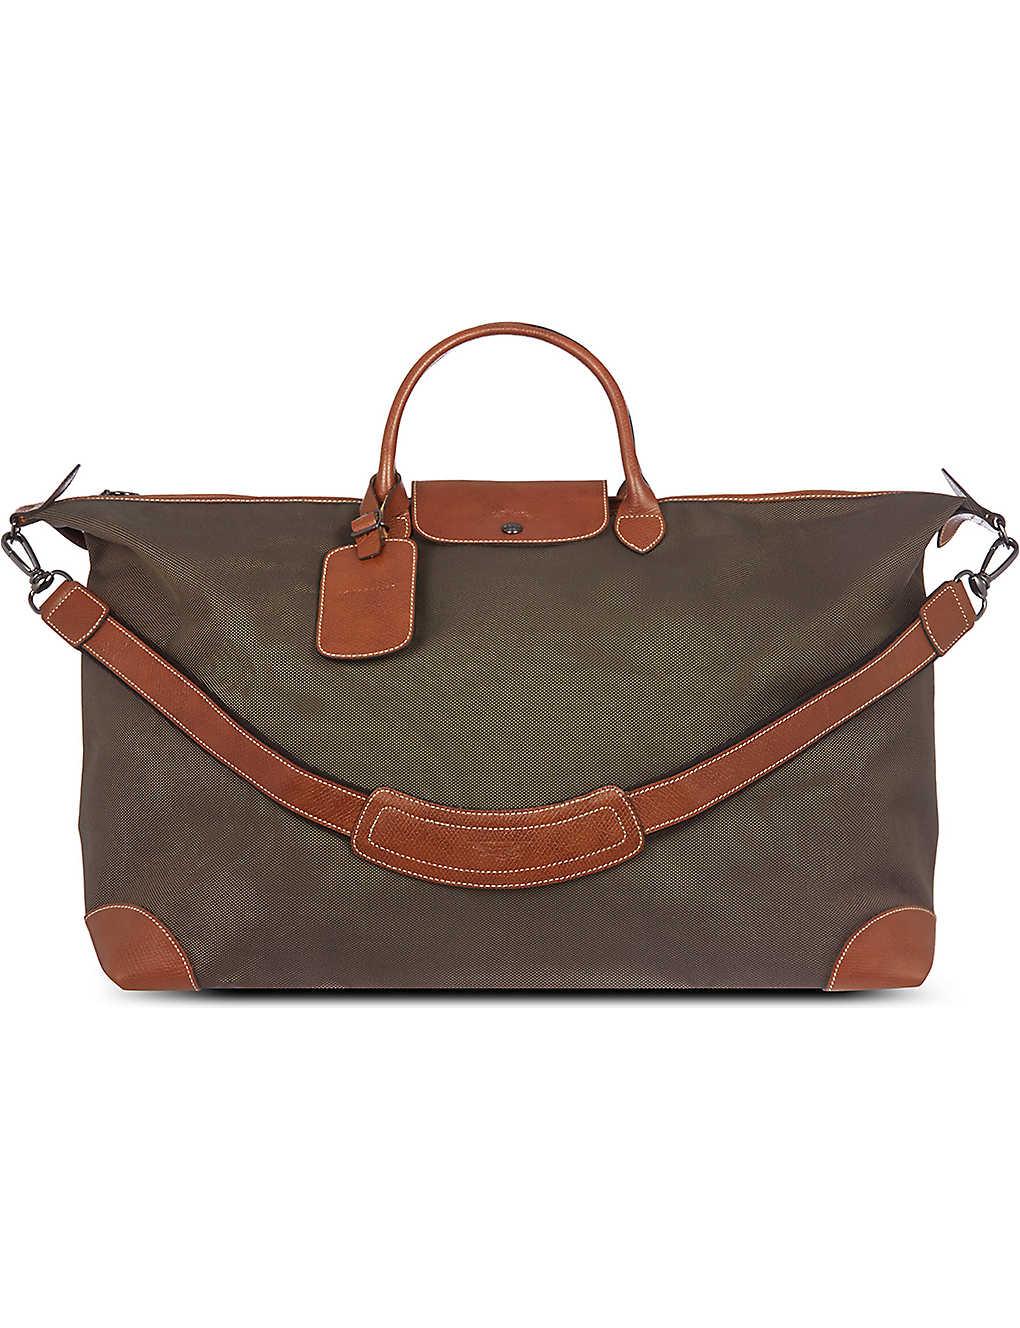 27a307e8edc5 LONGCHAMP - Boxford travel bag | Selfridges.com